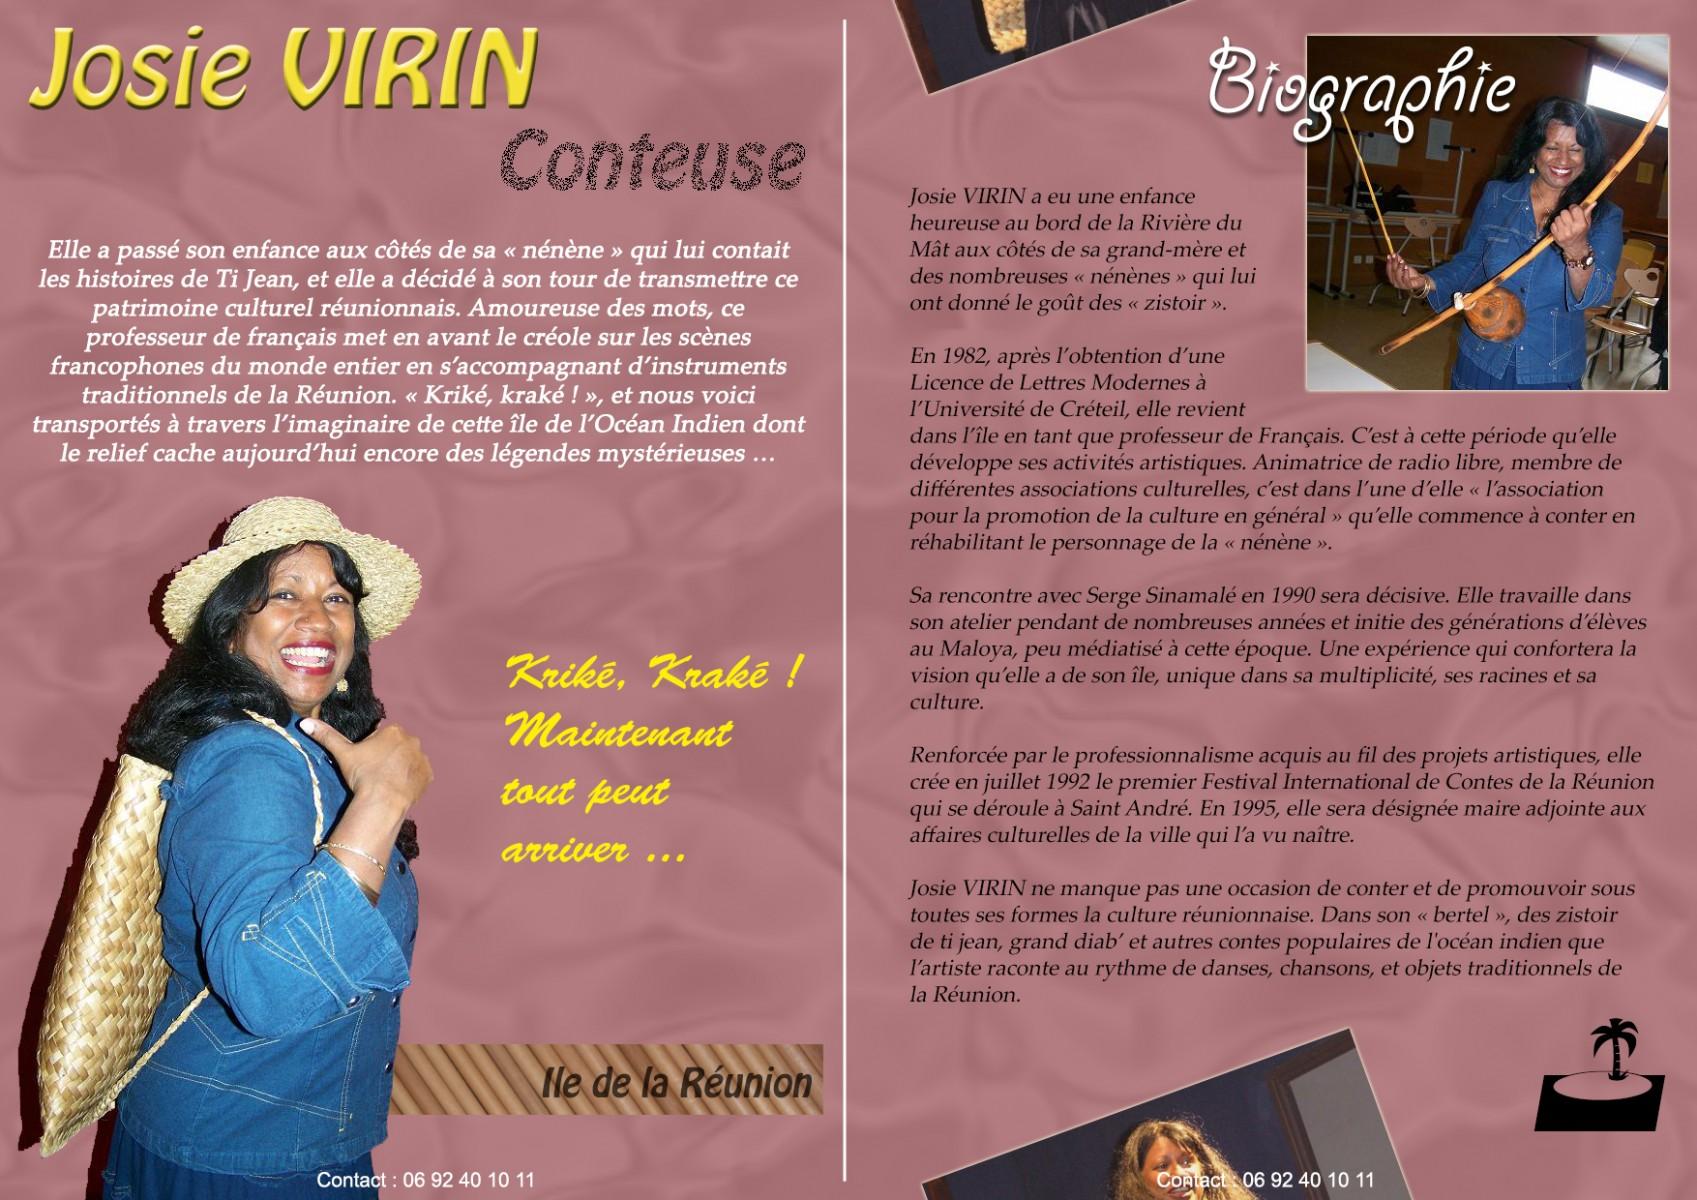 Biographie de Josie Virin